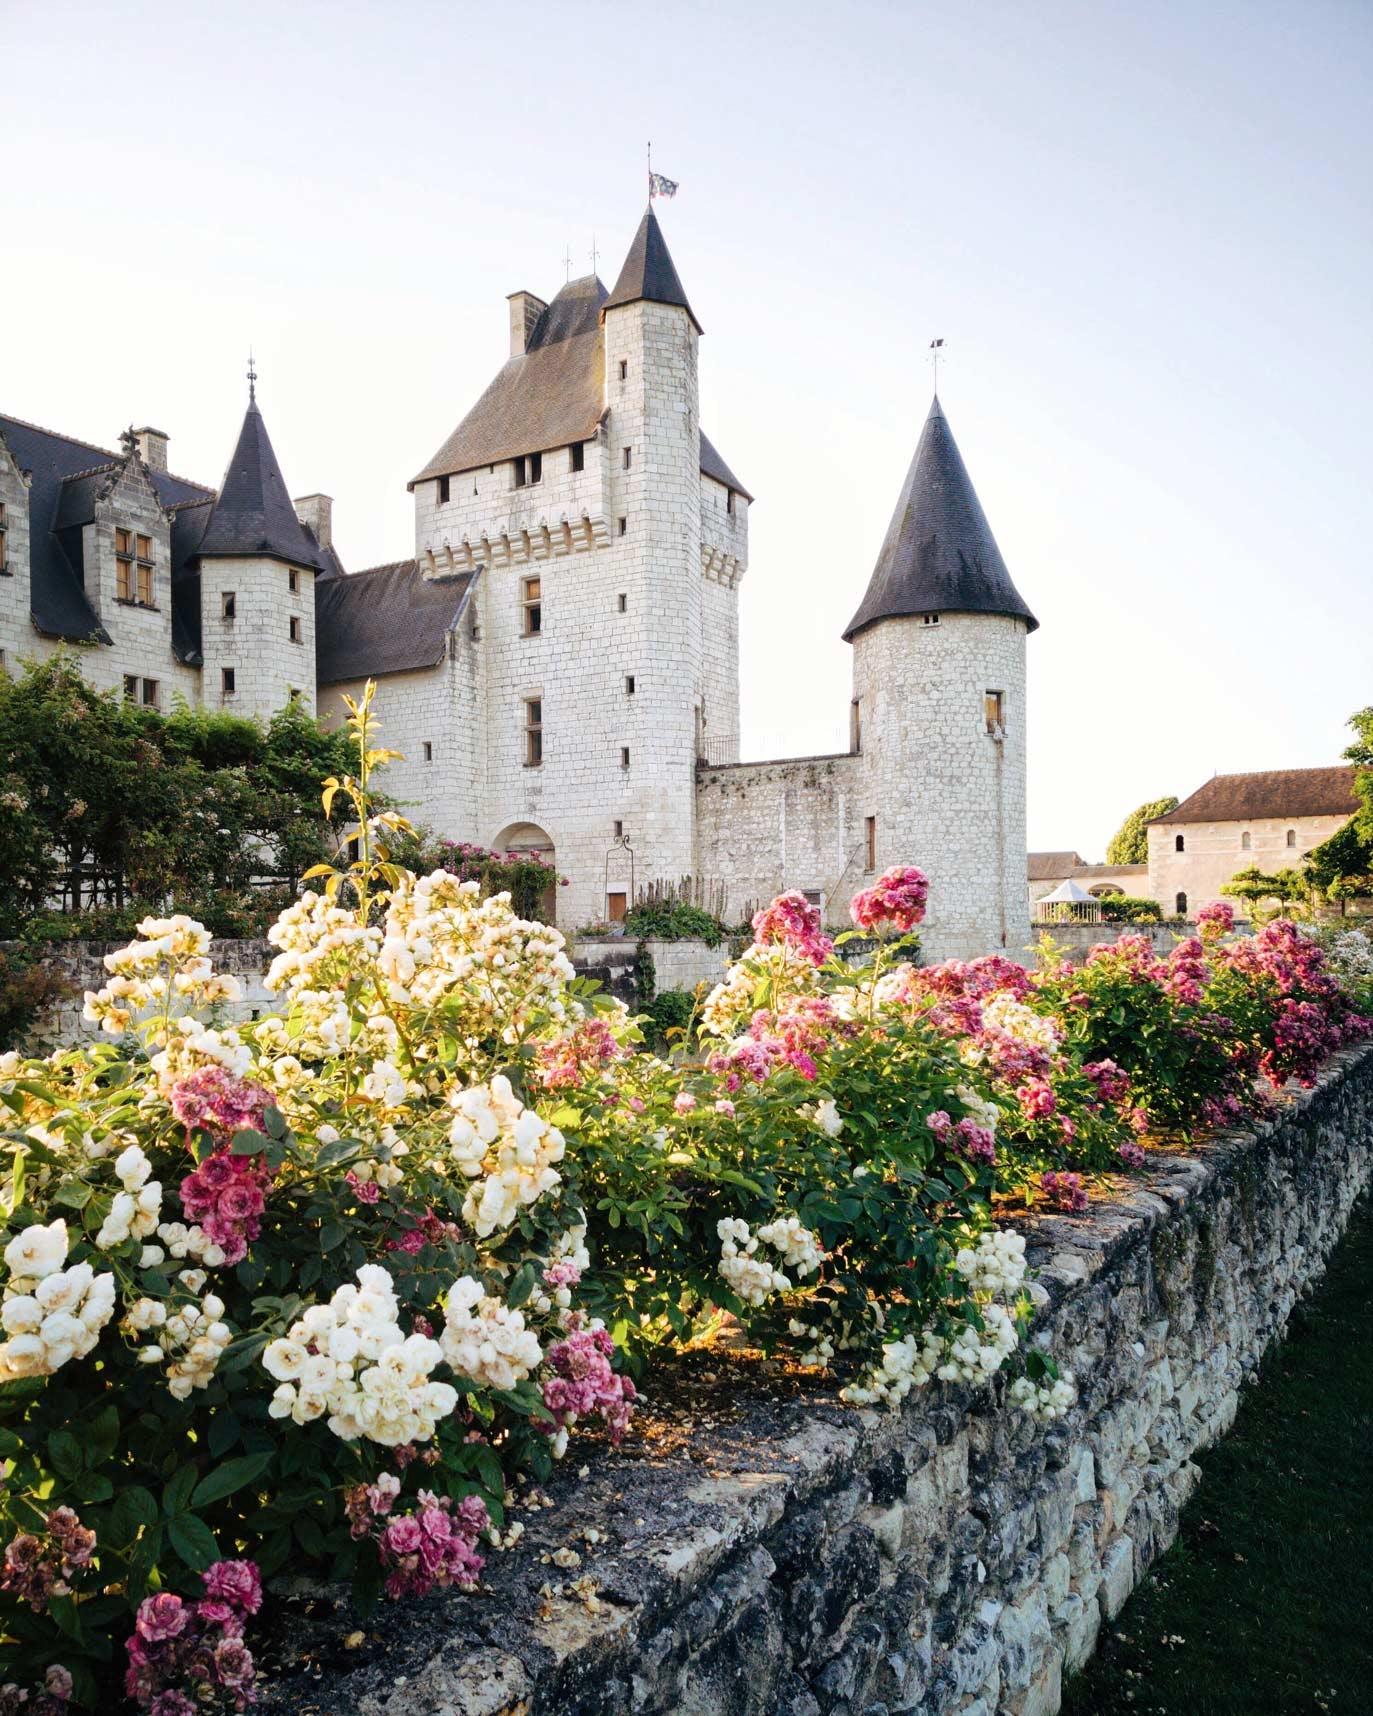 Château du Rivau Garden & Castle